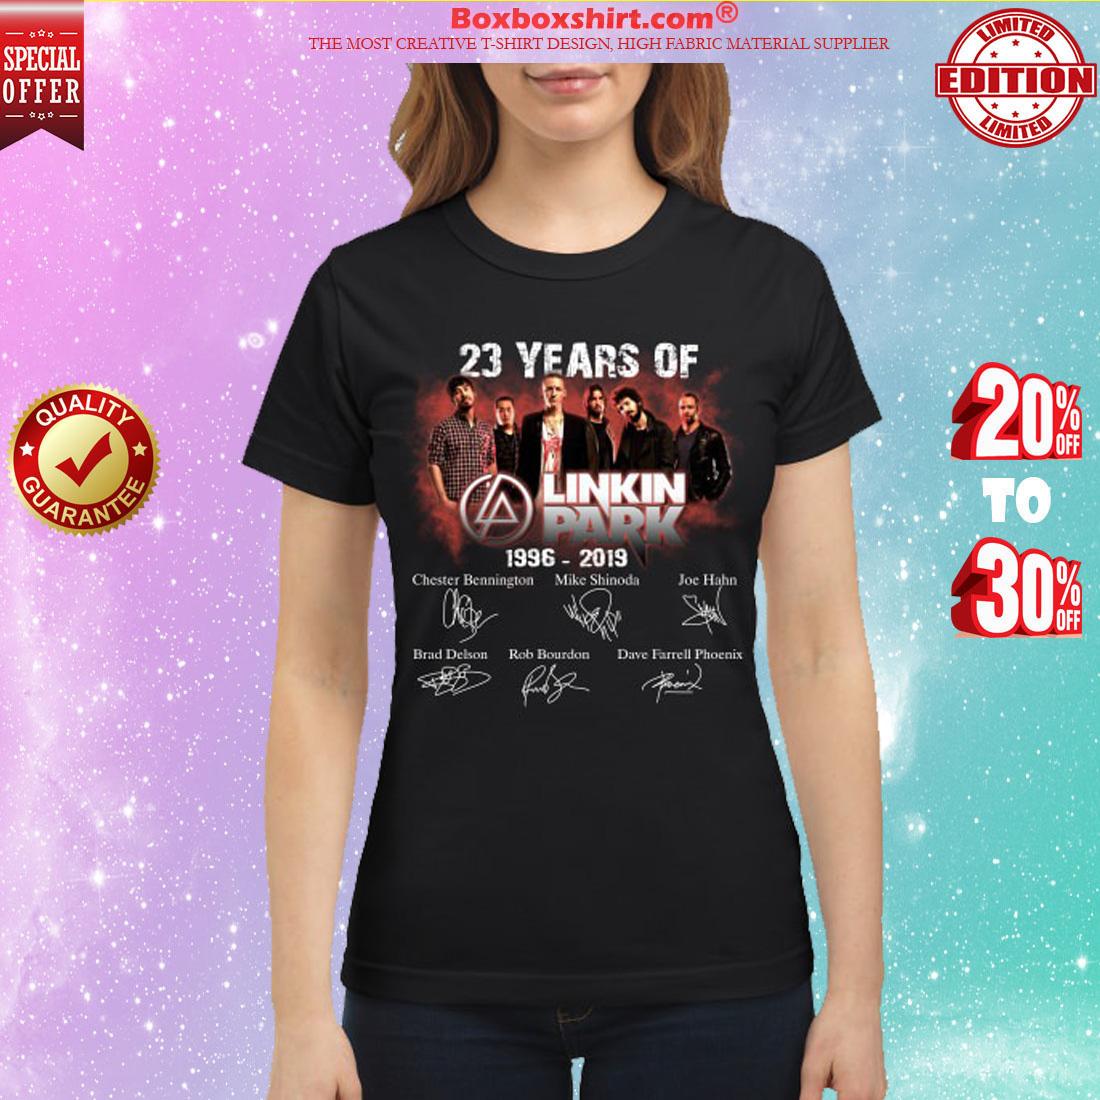 23 years of Linkin park 1996 2019 classic shirt